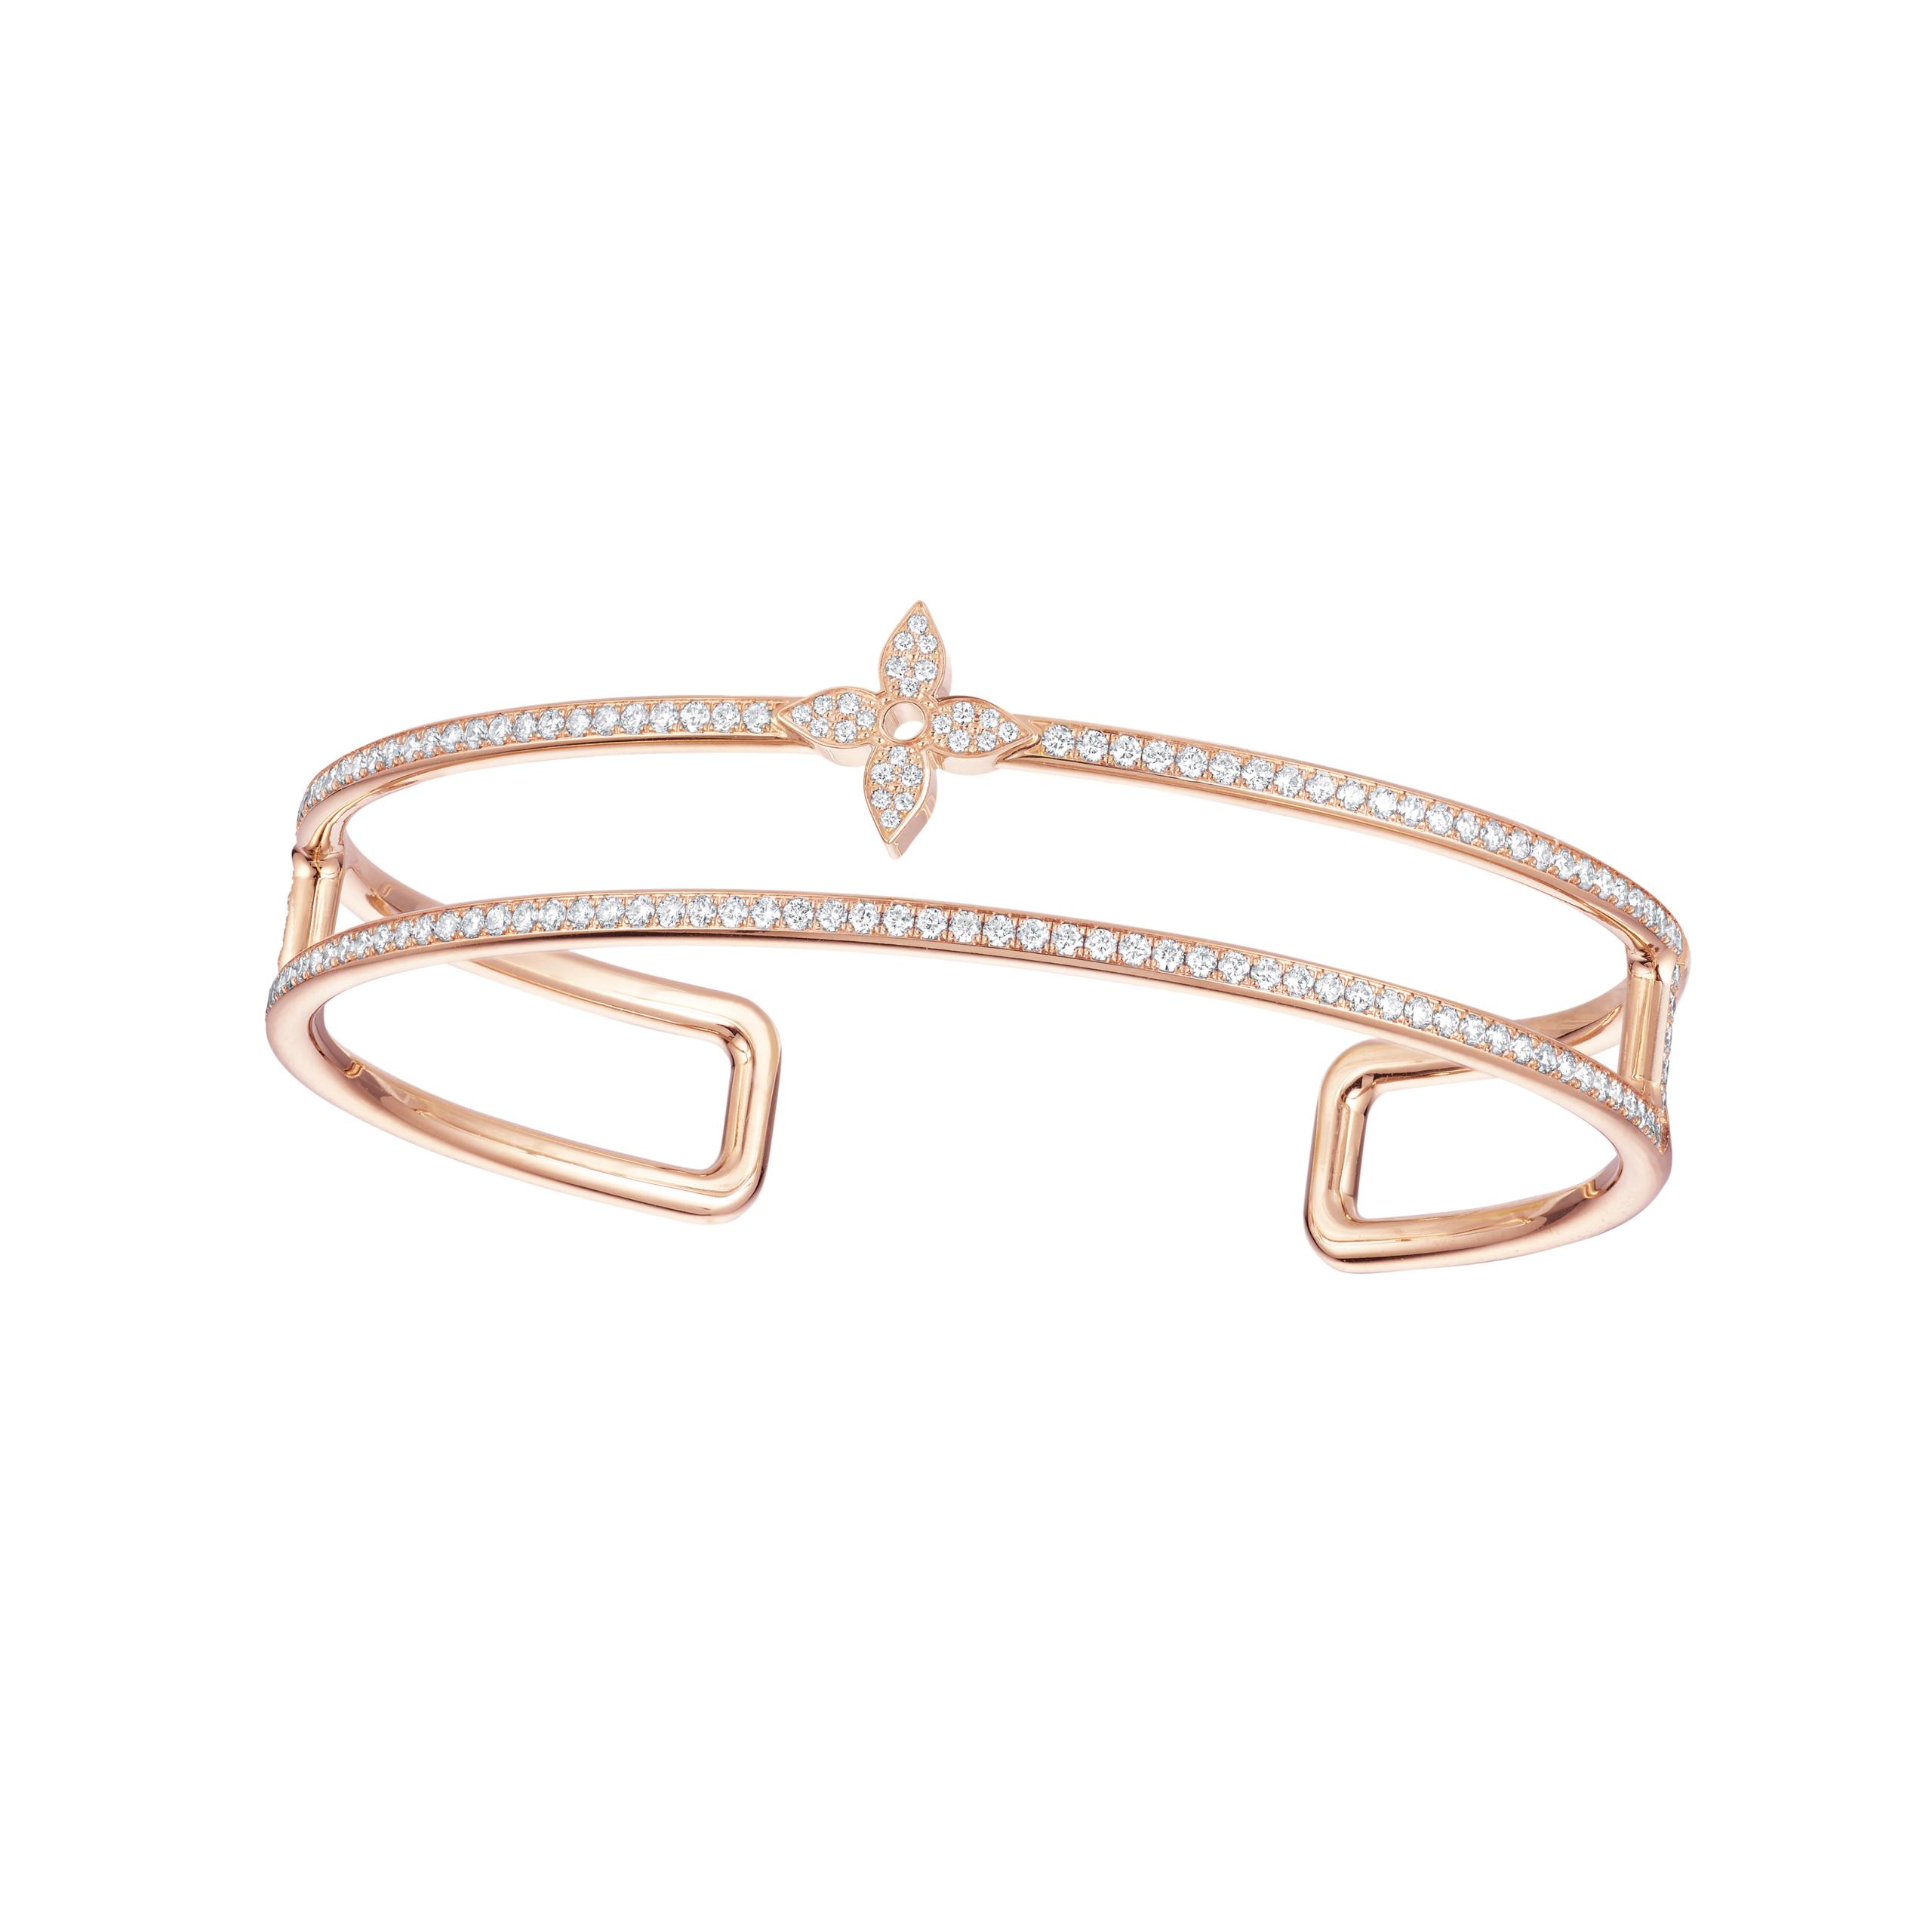 Louis Vuitton gioielli Idylle Blossom